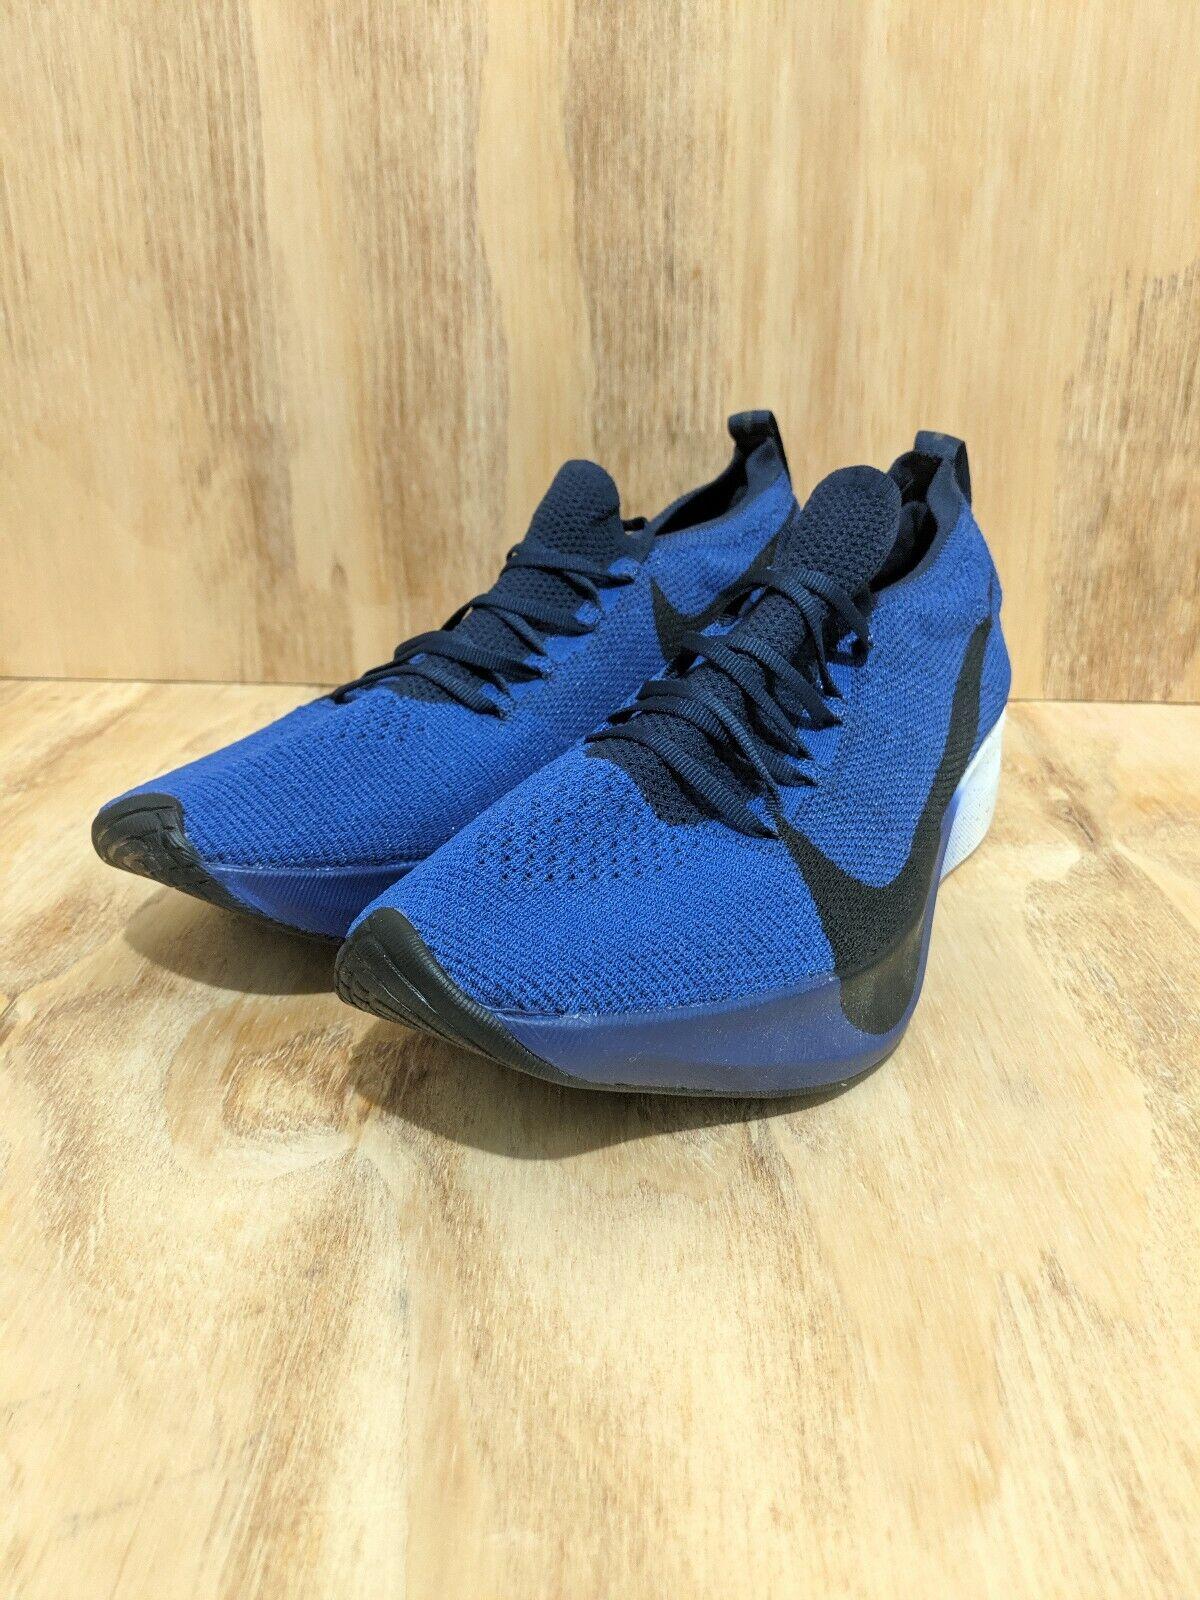 Nike Vapor Street Flyknit Running shoes Deep Royal  Men's Size 12